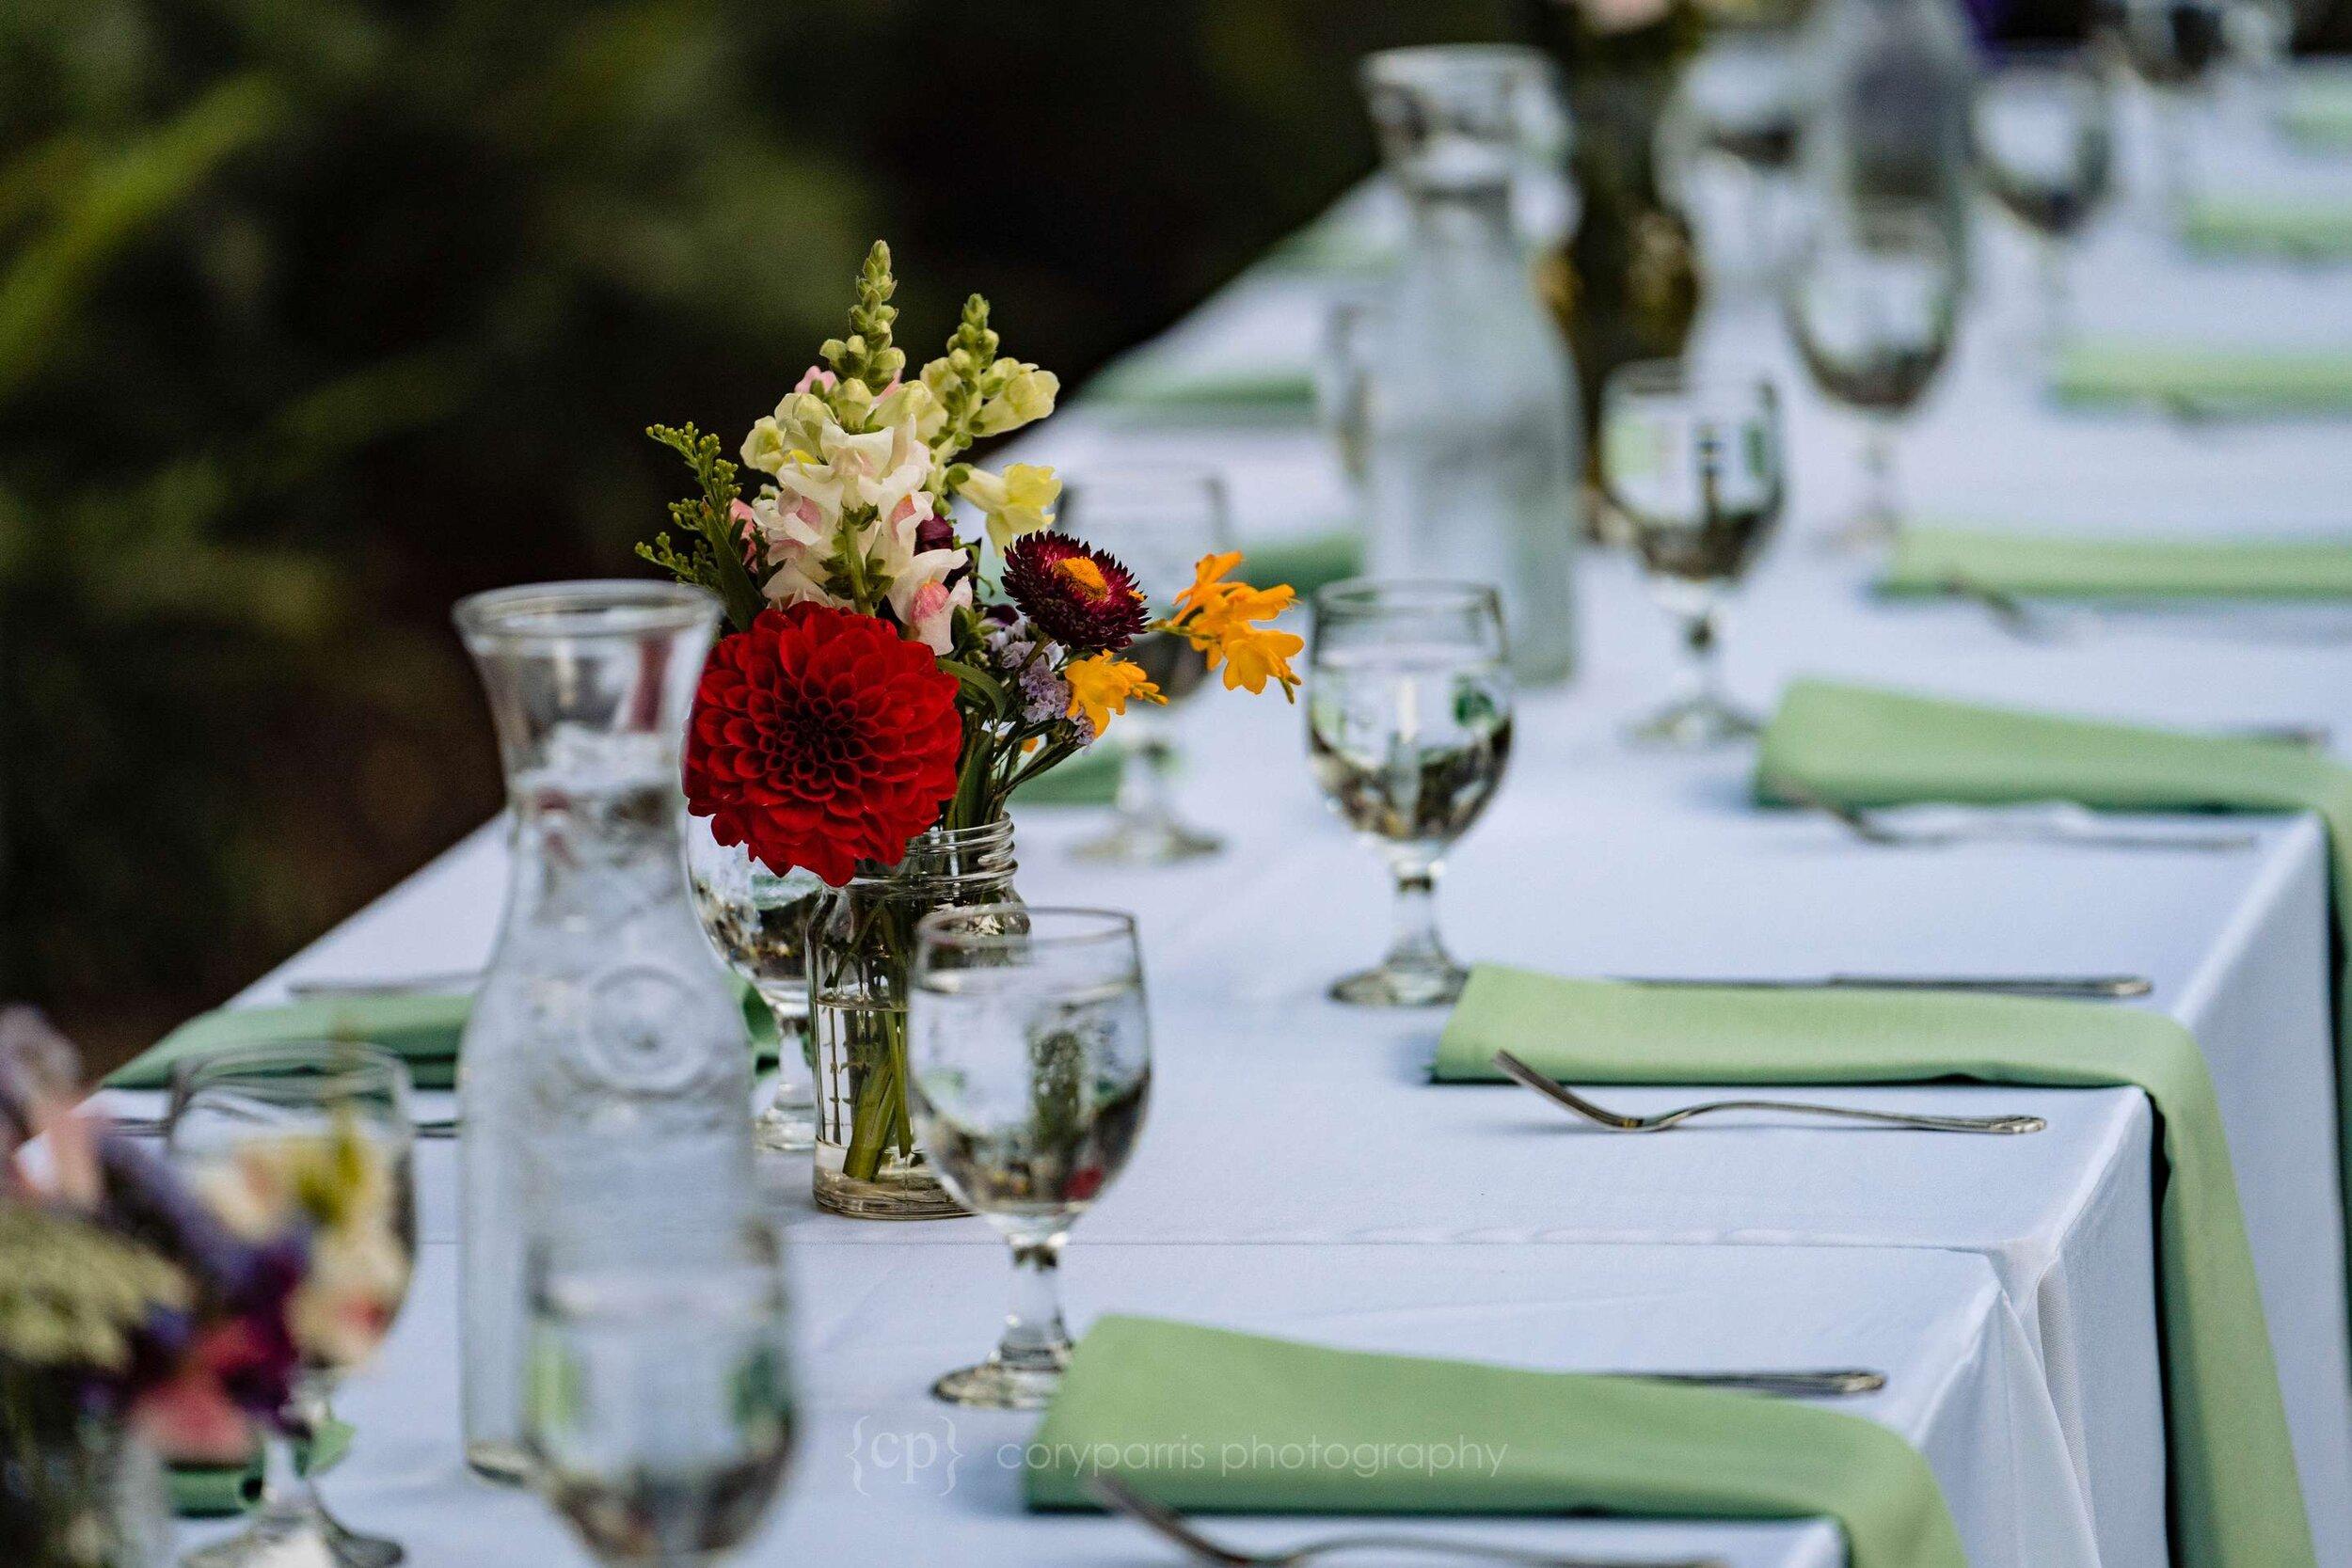 386-washington-park-arboretum-wedding.jpg